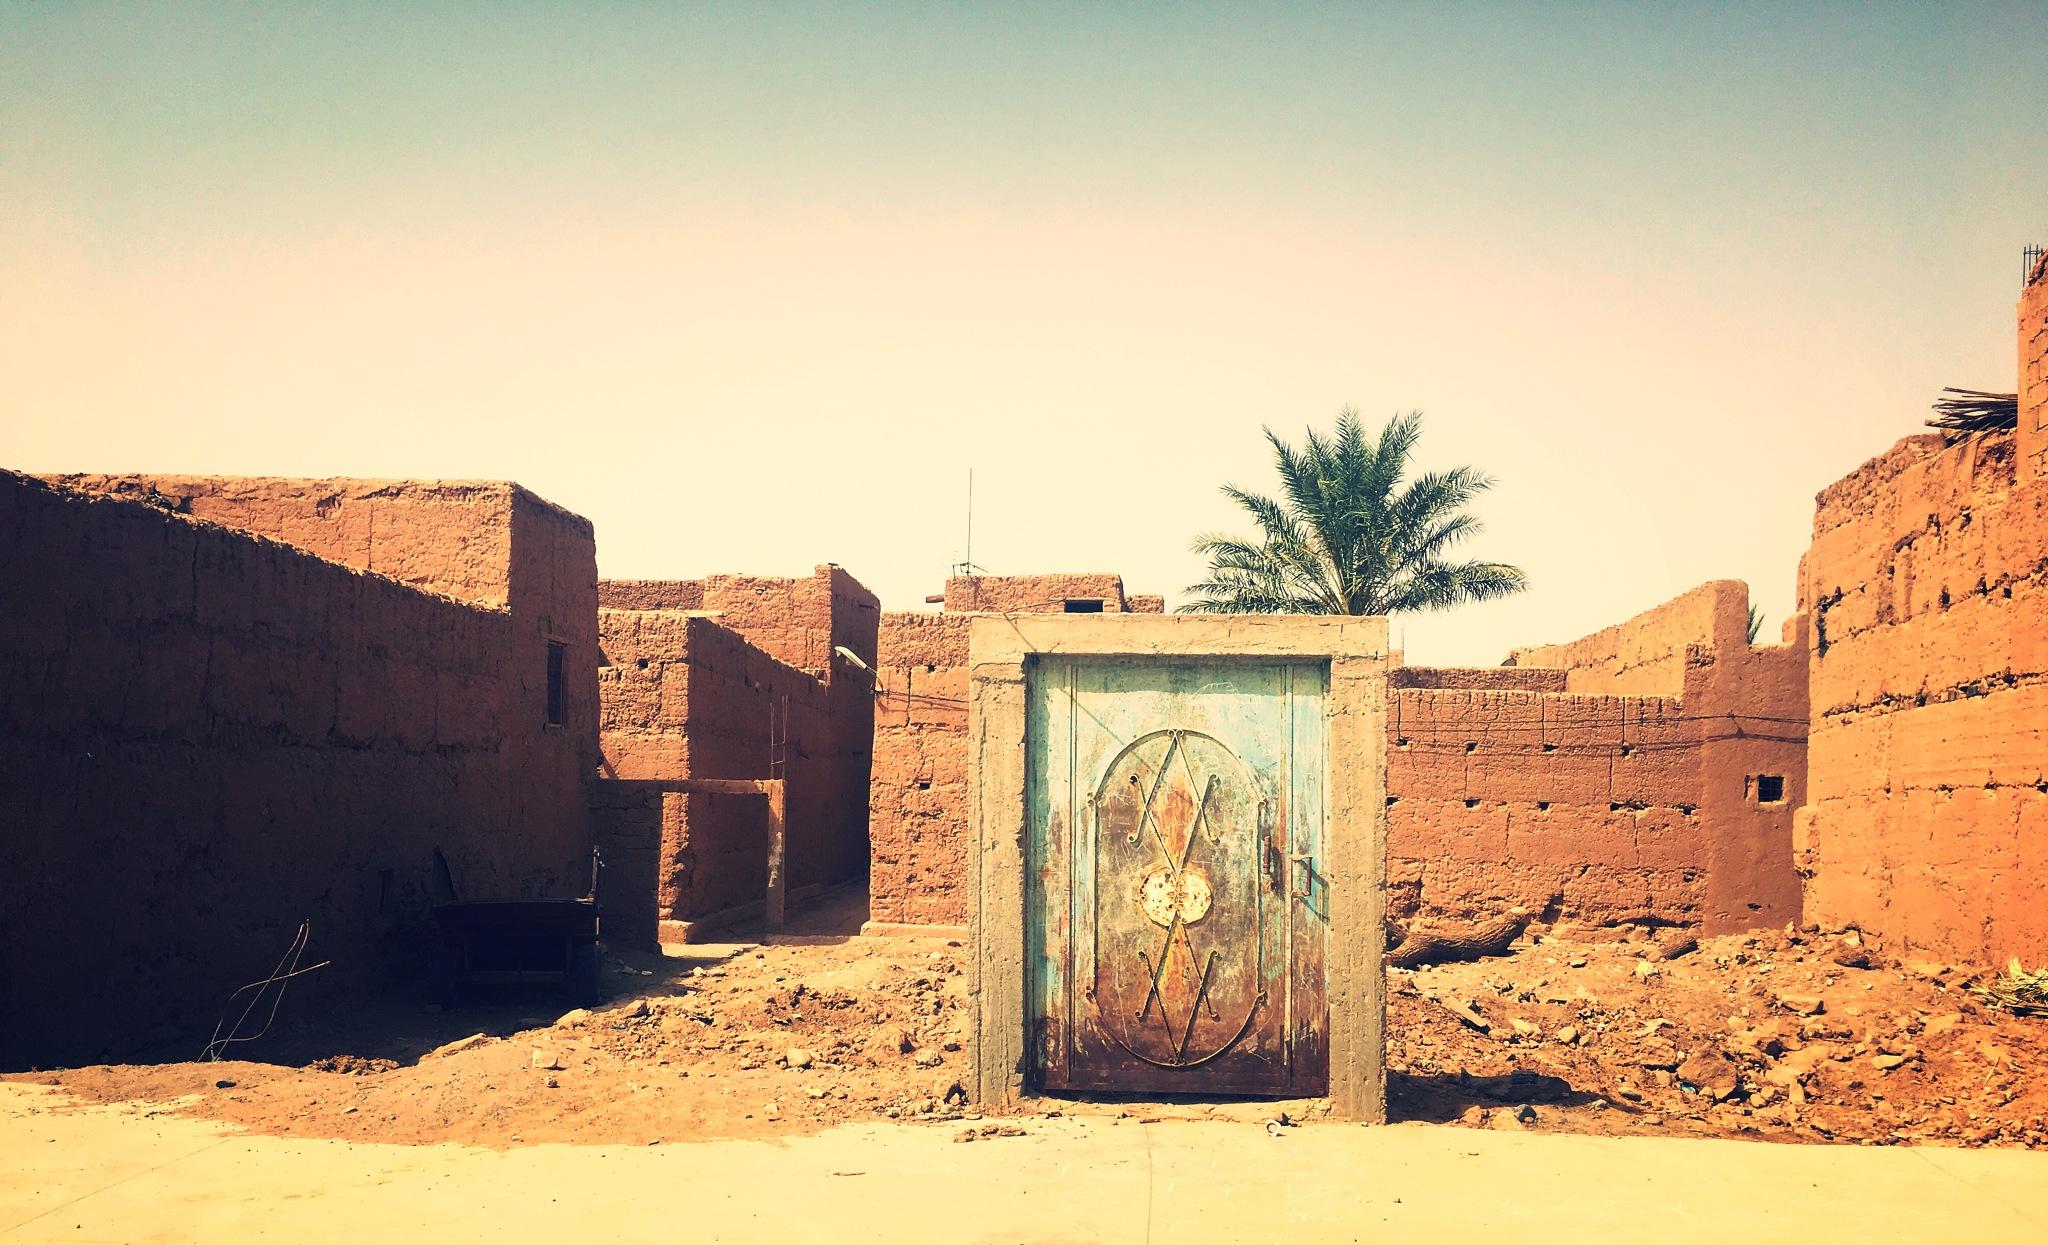 Kasbah Zagora Morocco by Rachdel